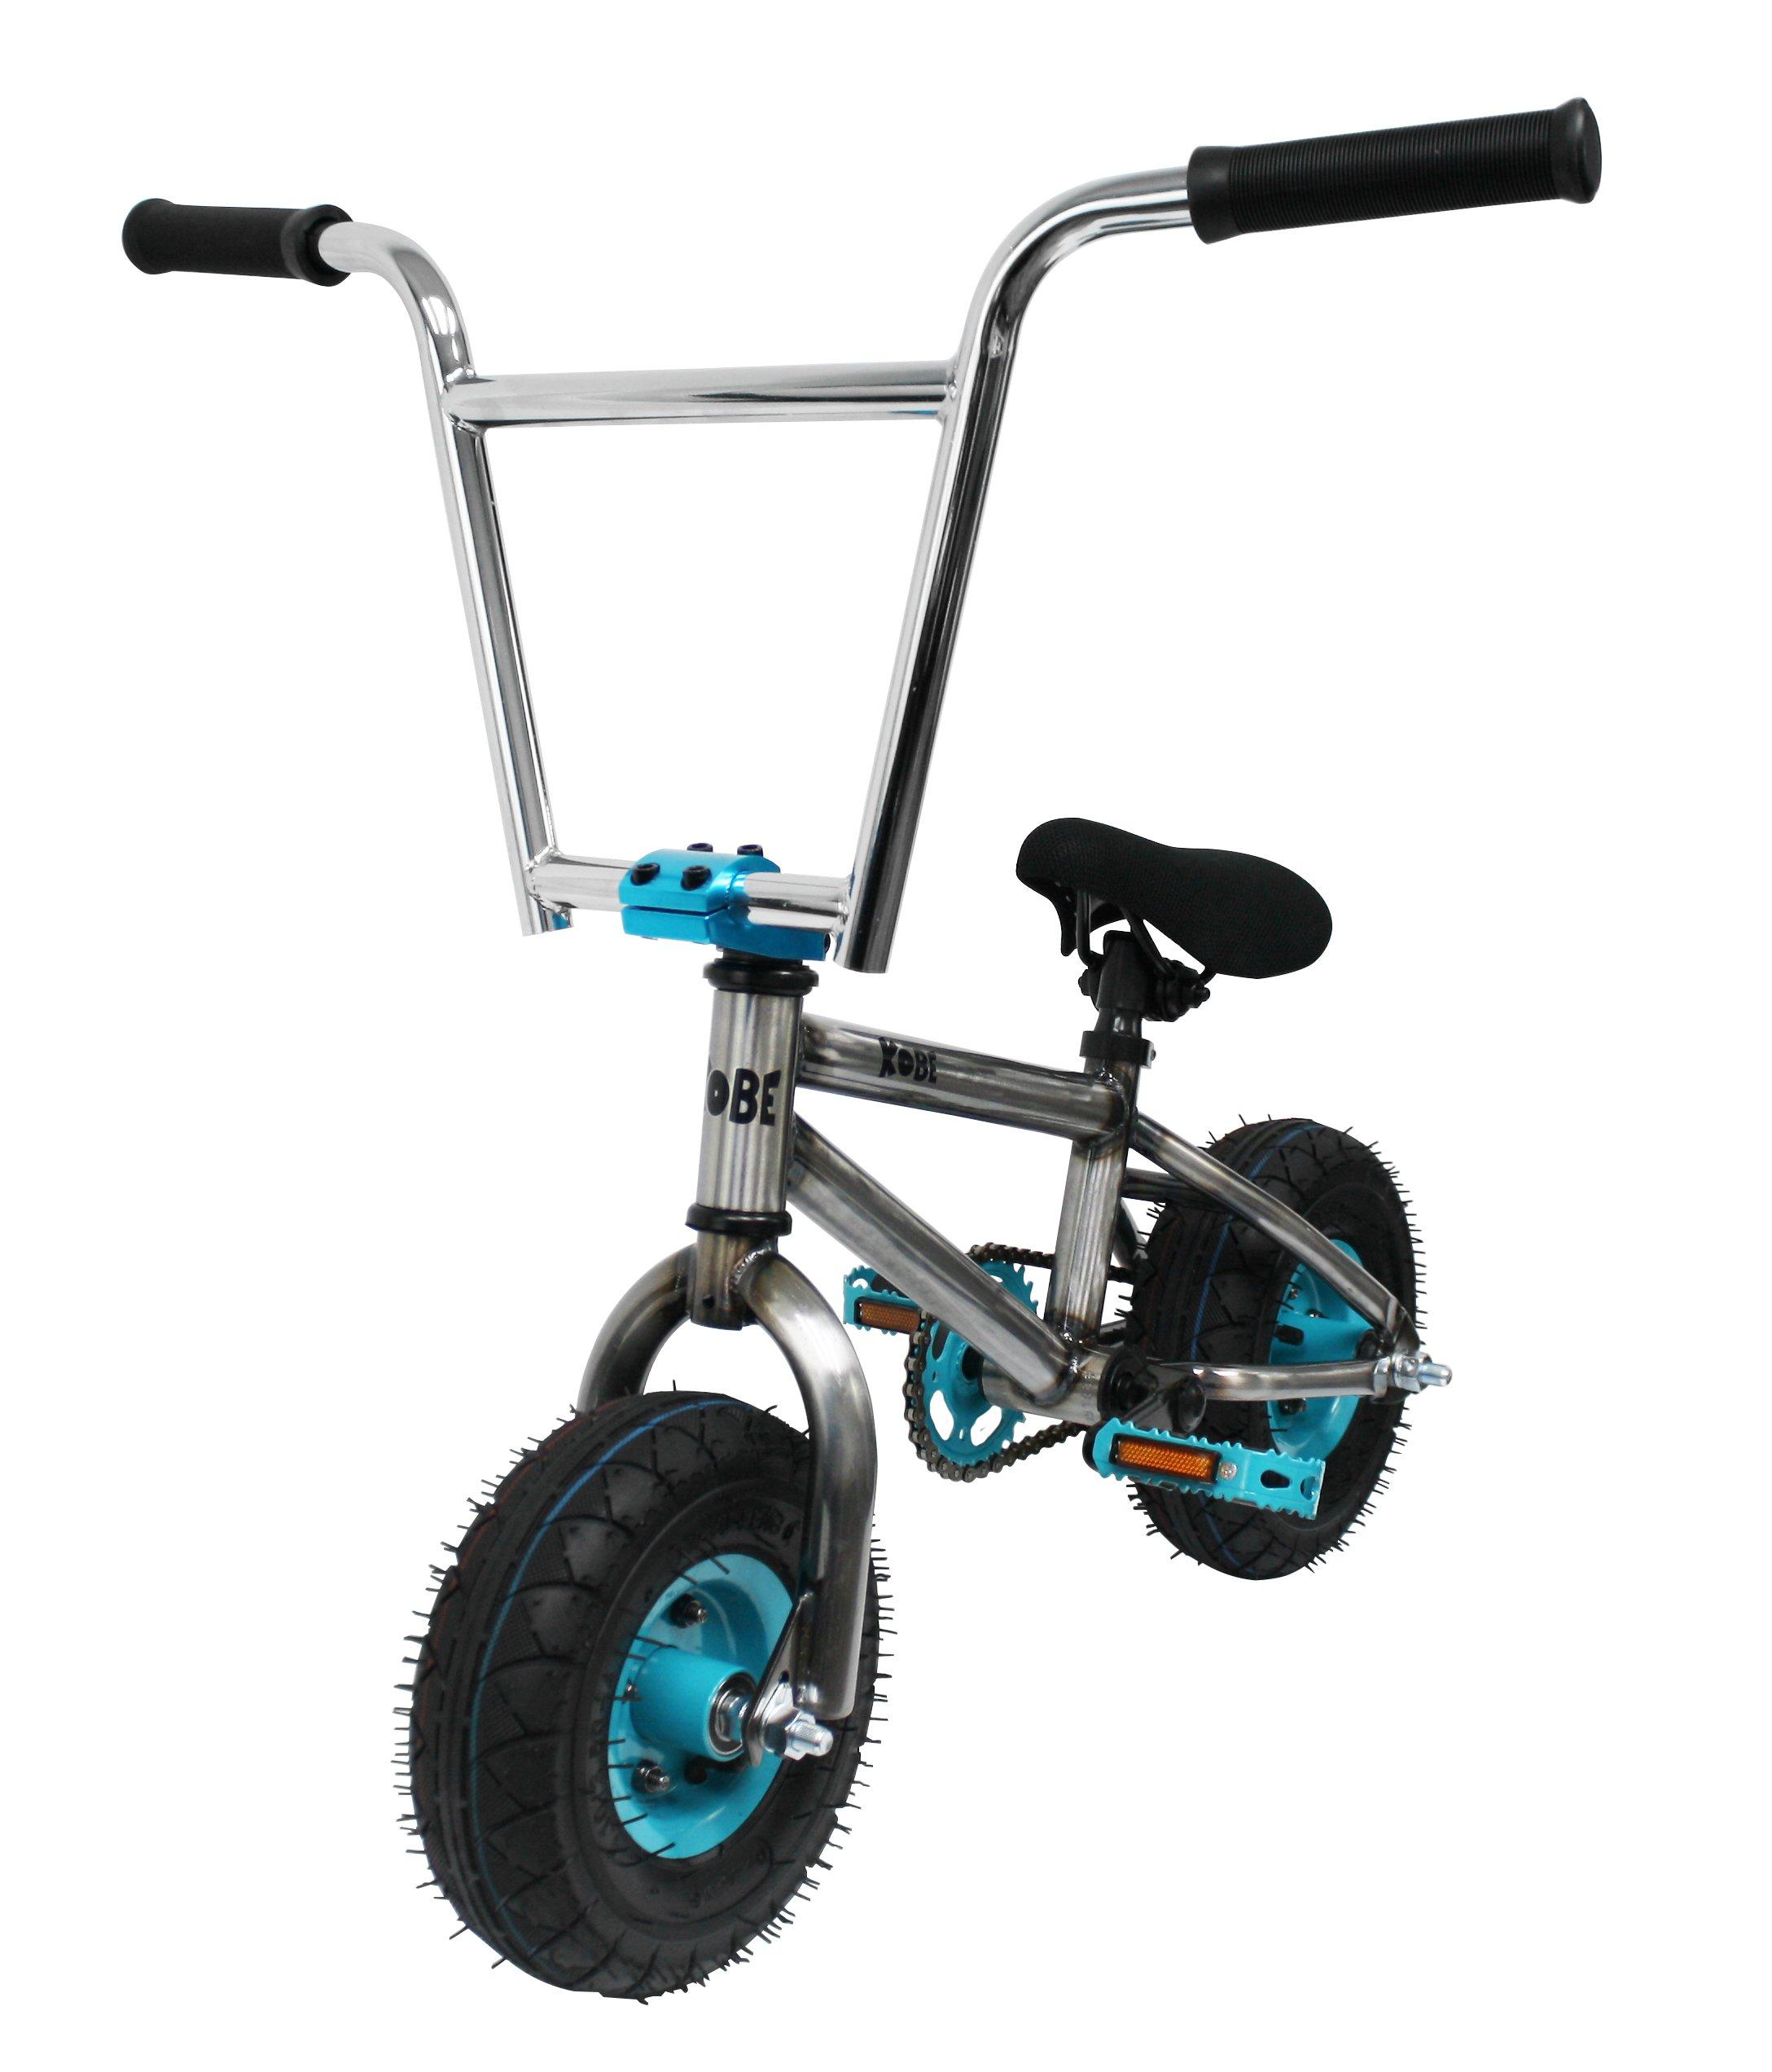 Kobe ''Rusty Rat Rod'' Mini BMX - Raw + Blue - Freestyle, Trick, Stunt Bicycle 10'' Wheels